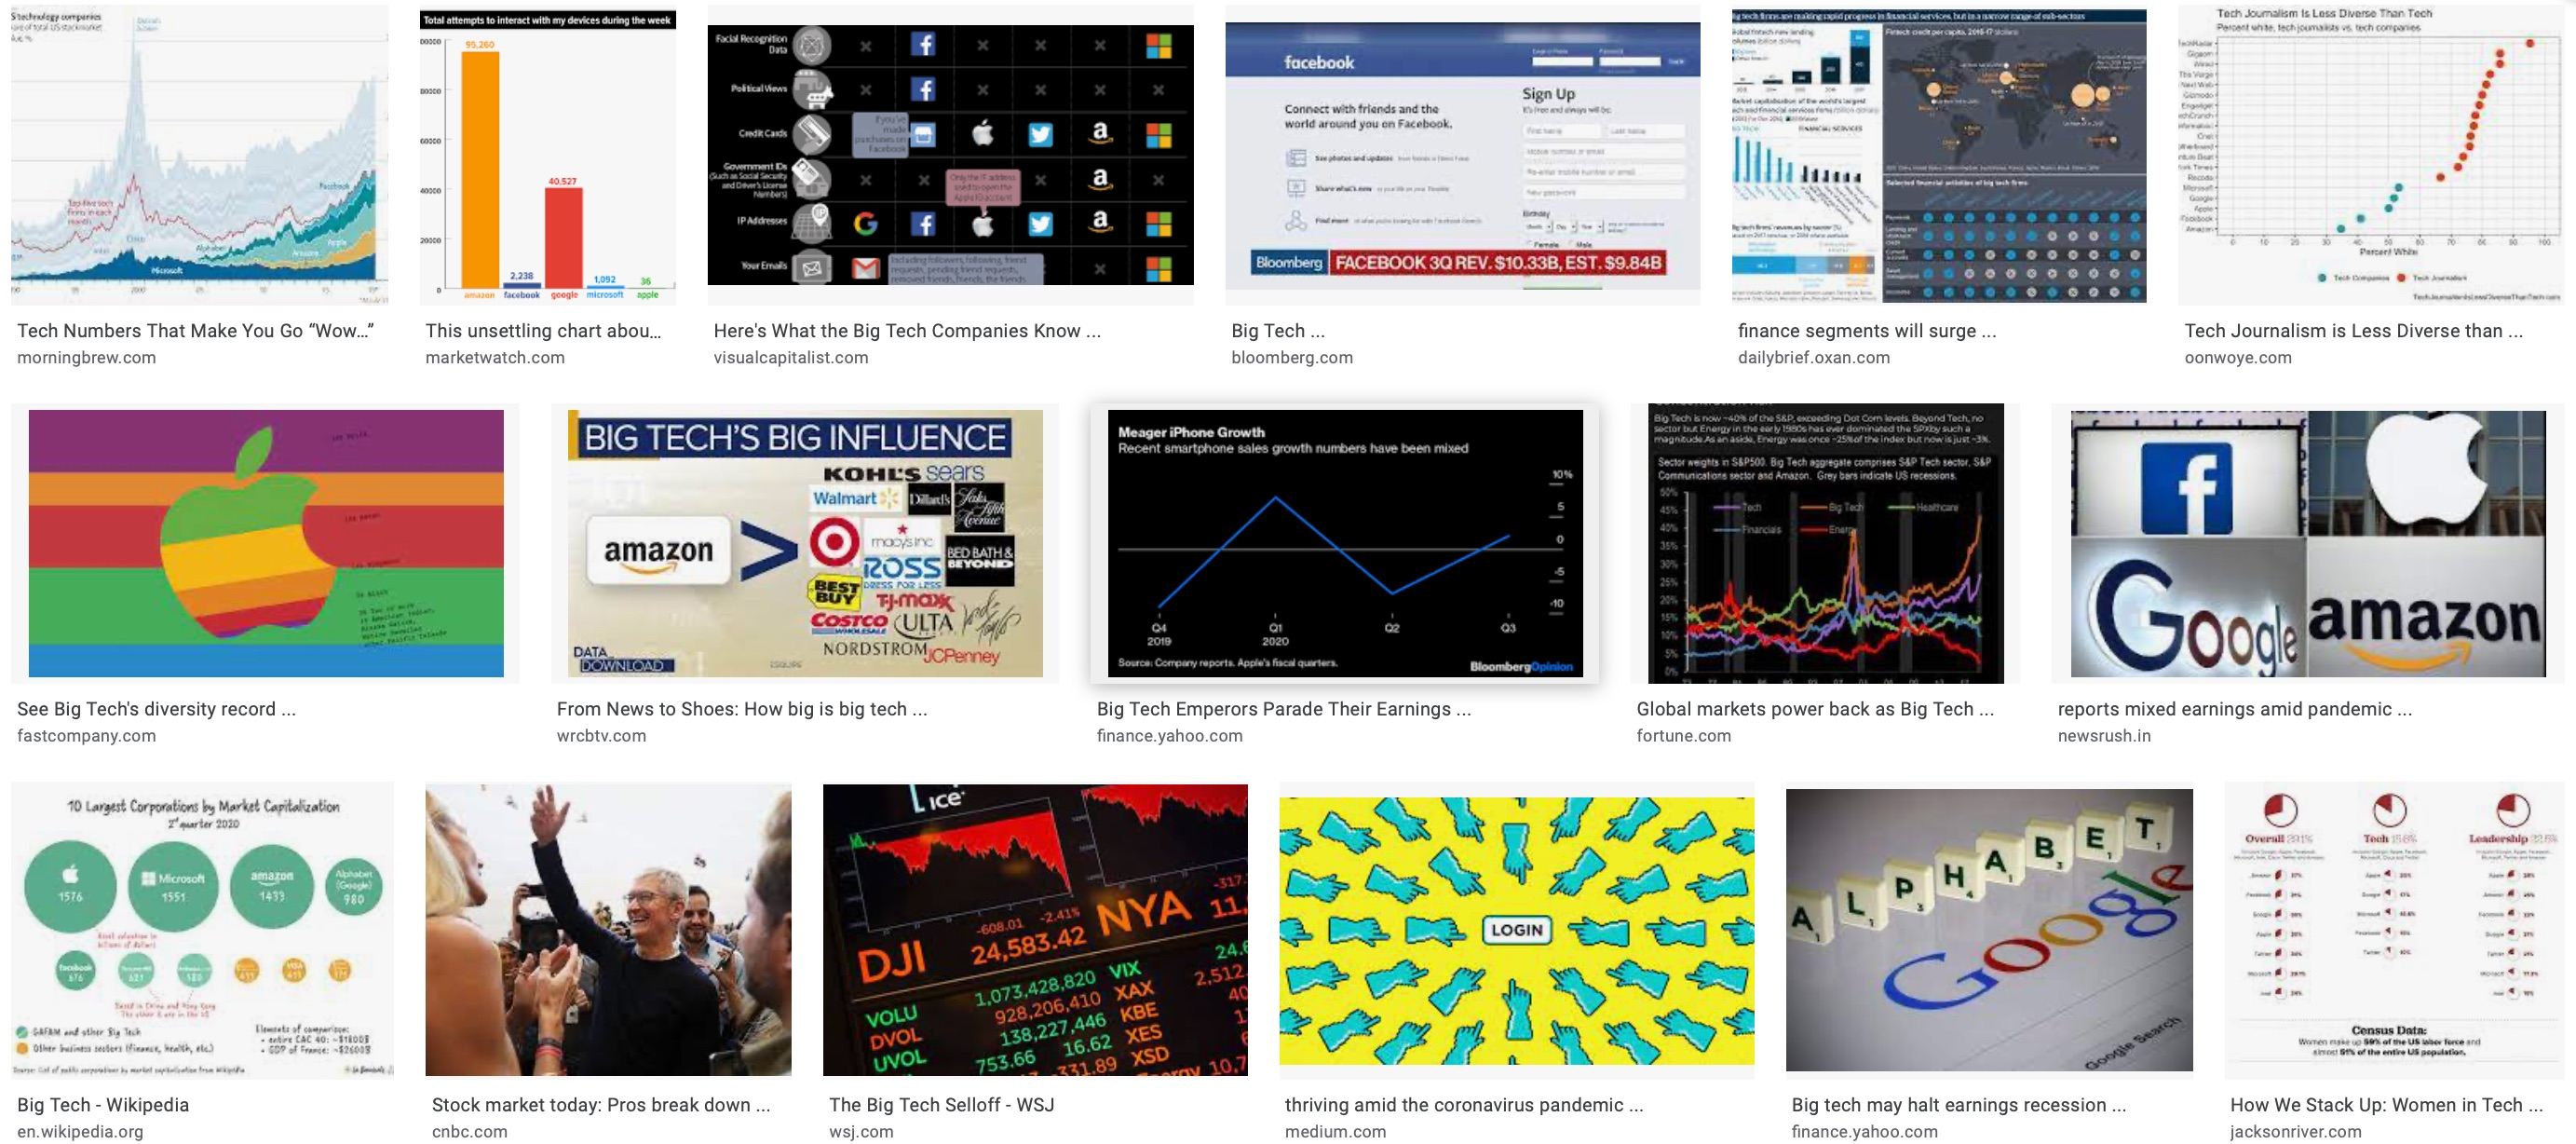 /five-recent-faagm-statistics-that-underline-the-tech-industrys-longer-term-trends-mvg3ewm feature image